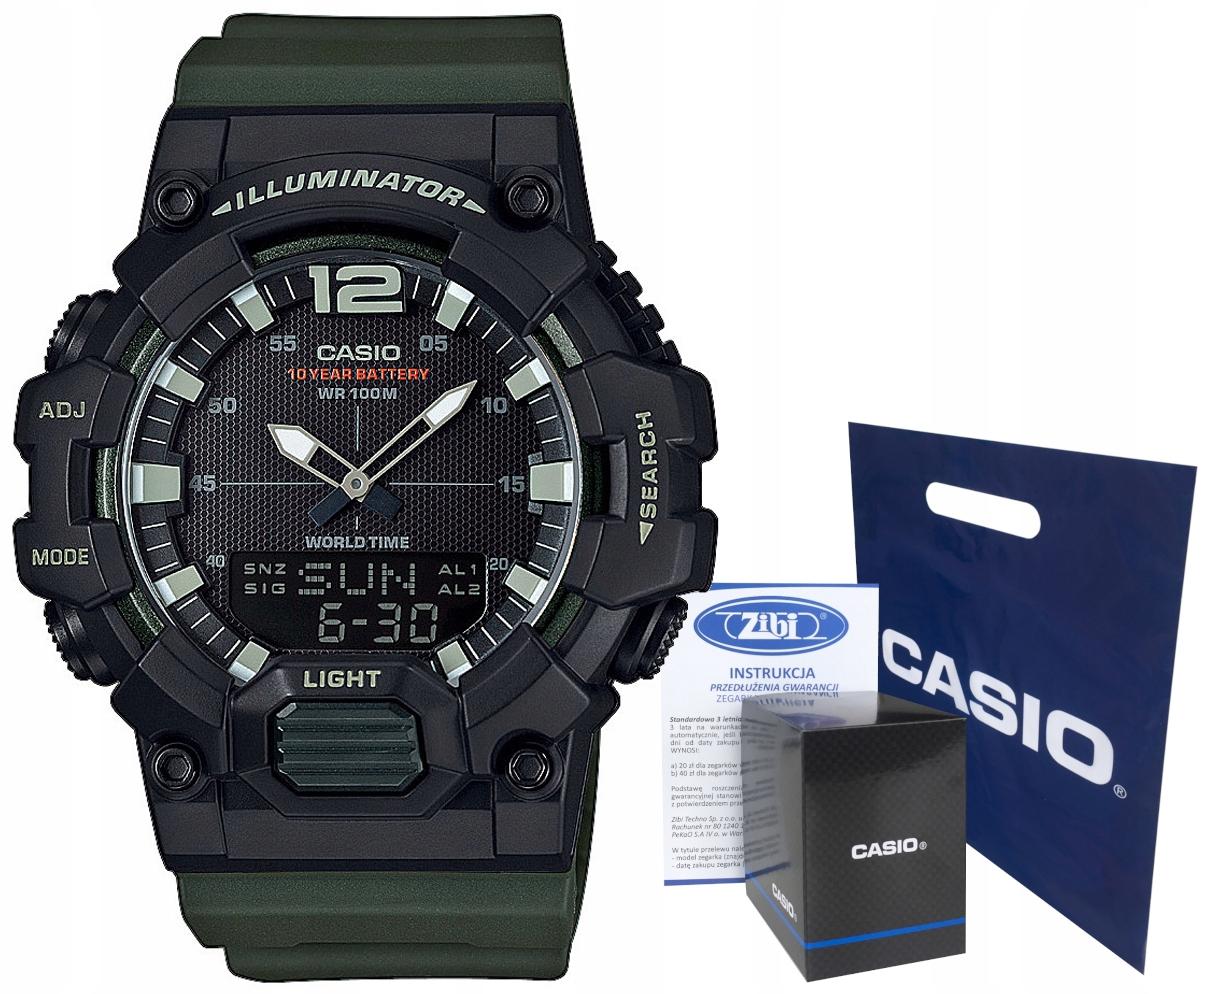 Casio HDC 700 1AVEF Zegarek Sklep ZEGAREK.NET